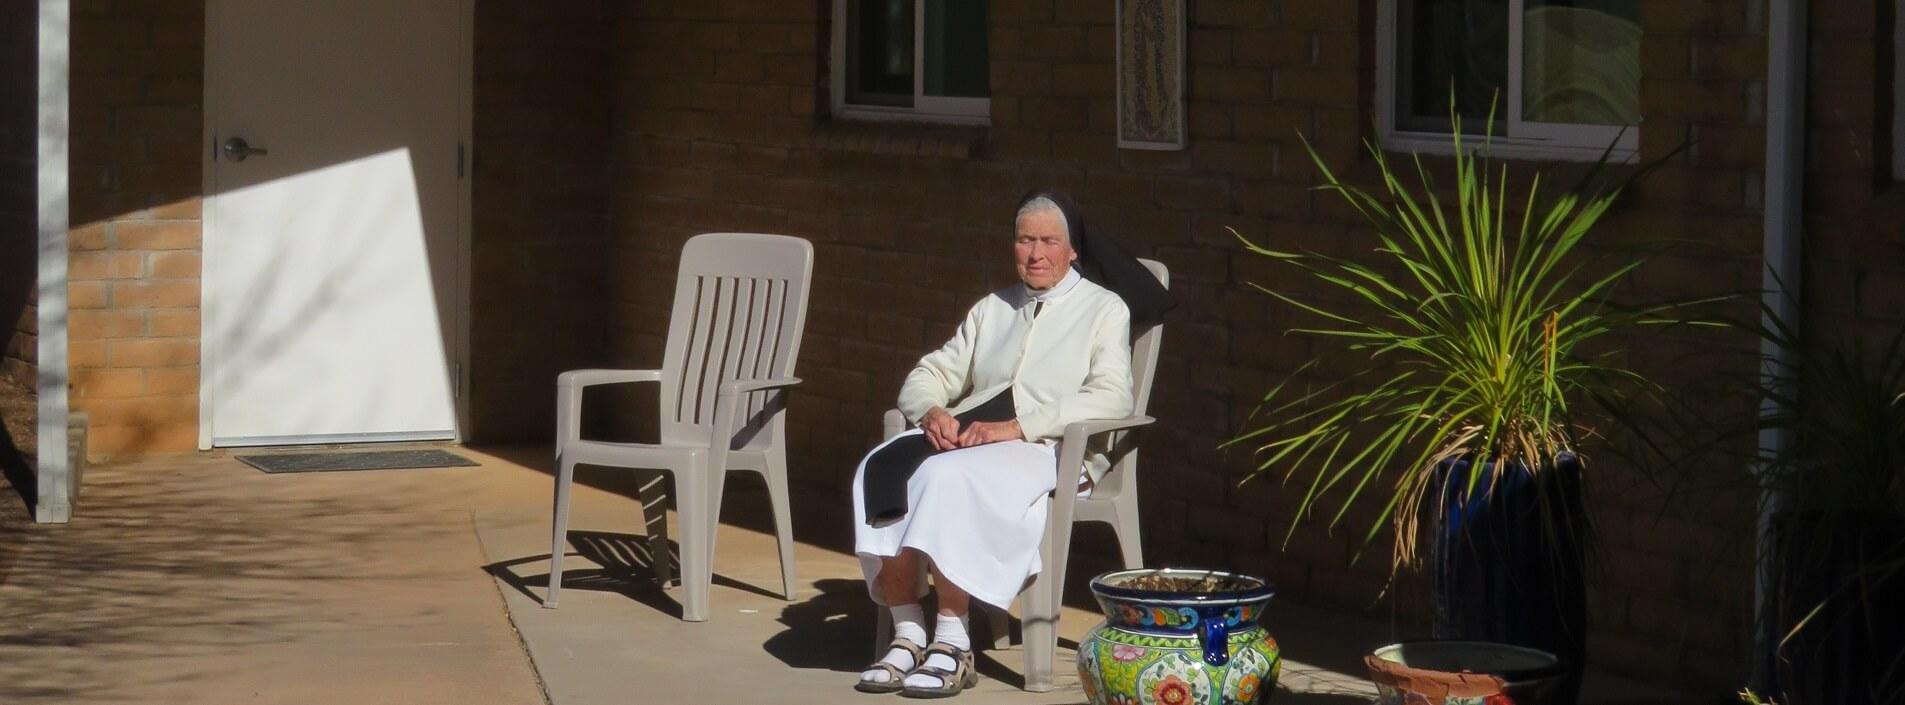 2021 01 18 Sister Kate praying rosary